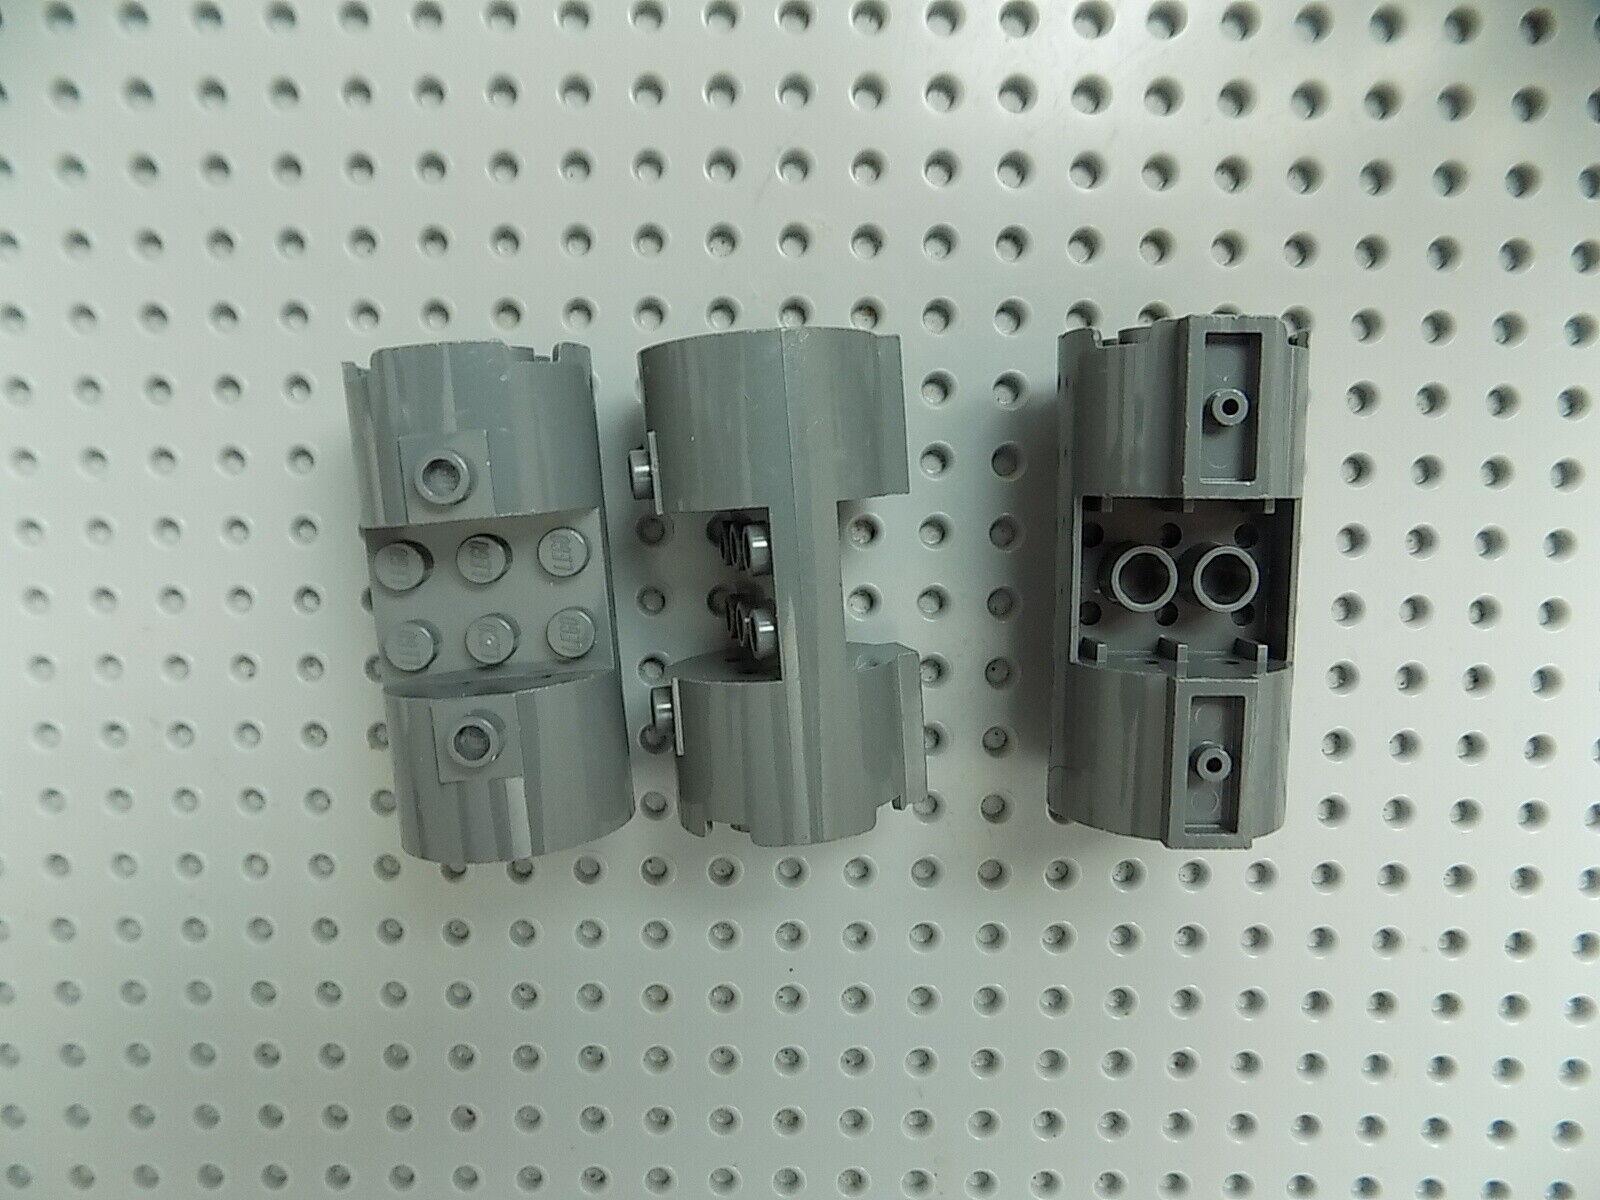 LEGO Dark Gray 3x3x6 Space Engine Cylinder Piece